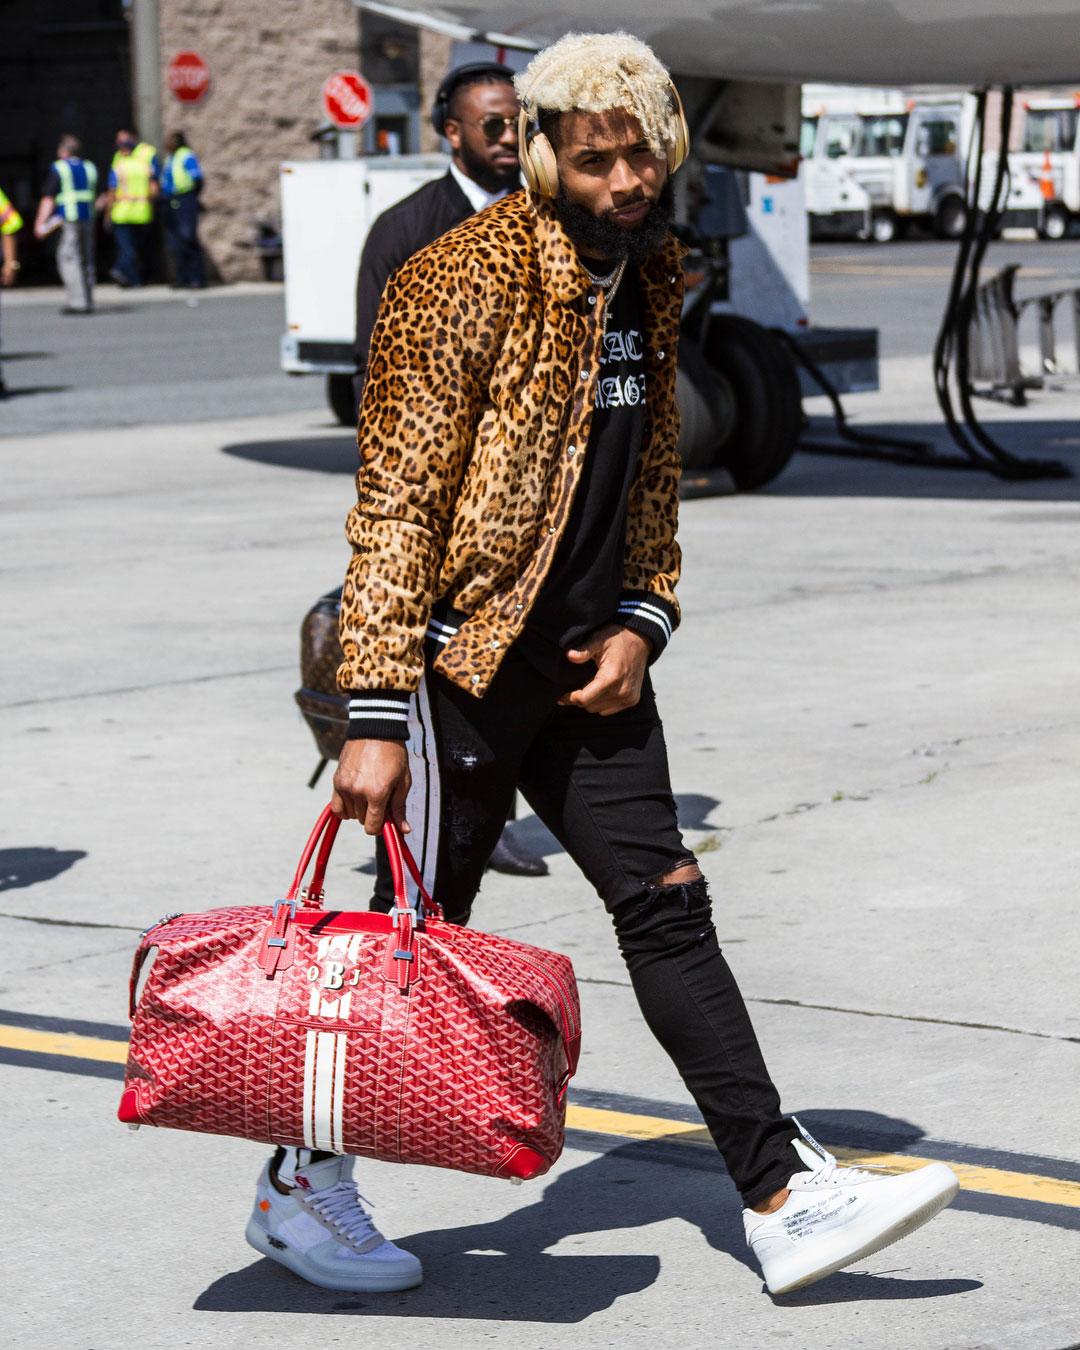 Cleveland Browns - Page 35 Odell-Beckham-Jr-Amiri-jacket-tee-jeans-Off-White-Nike-sneakers-Goyard-bag